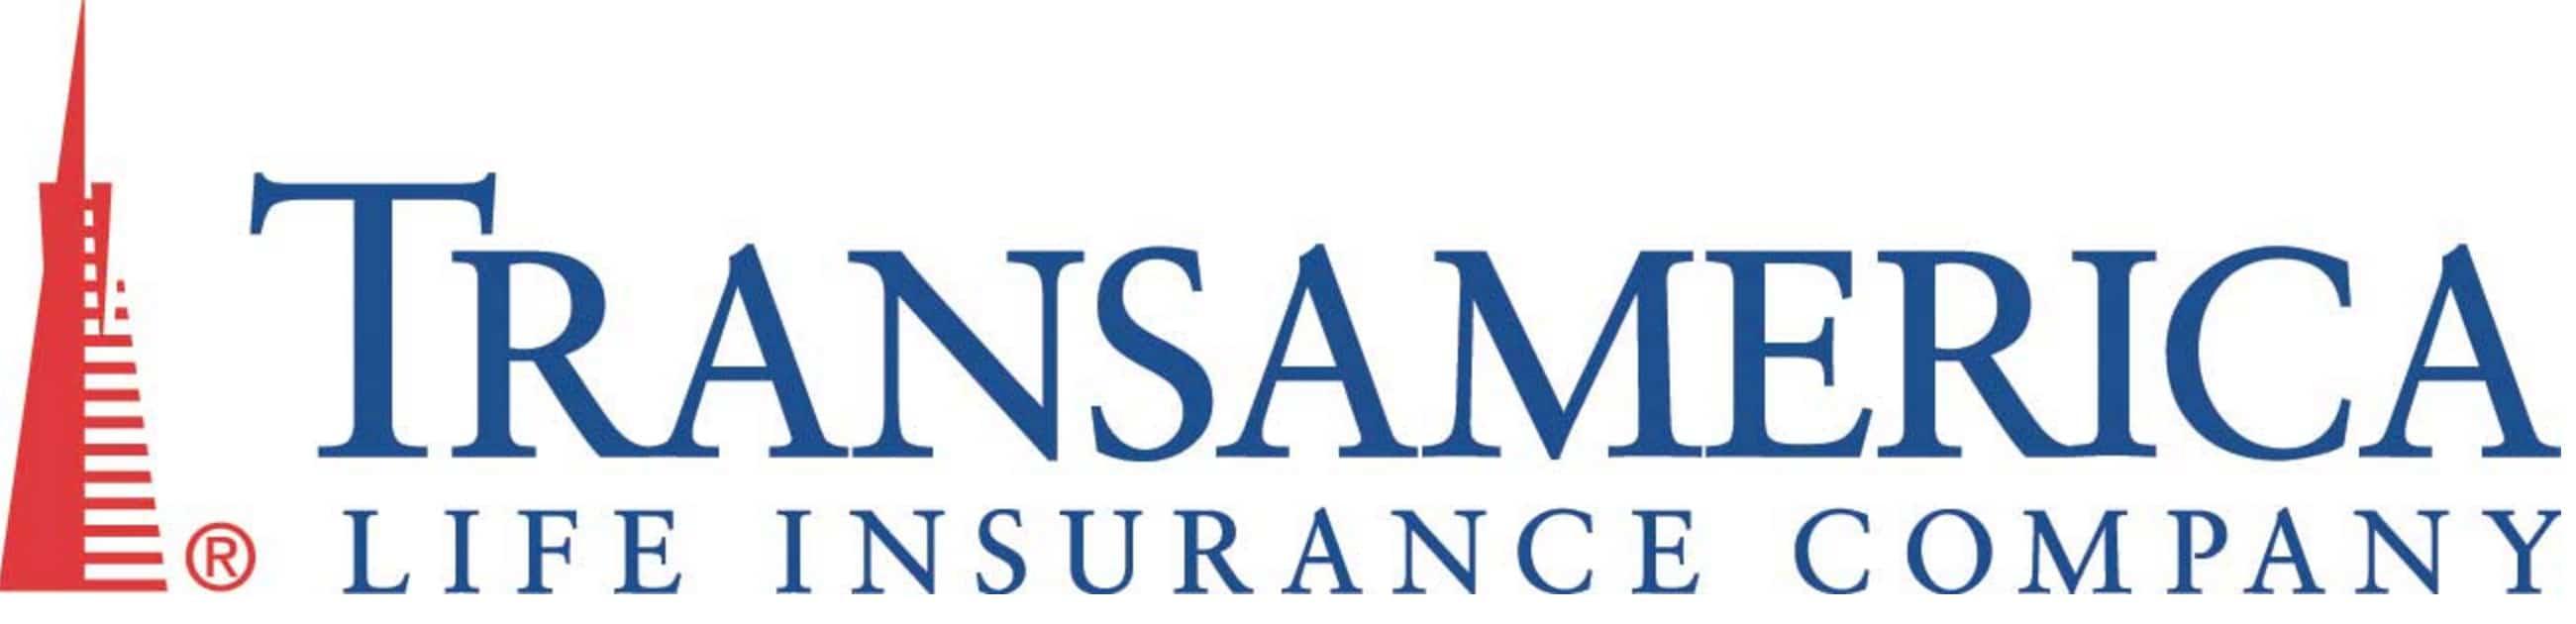 transamerica financial life insurance company photo - 1